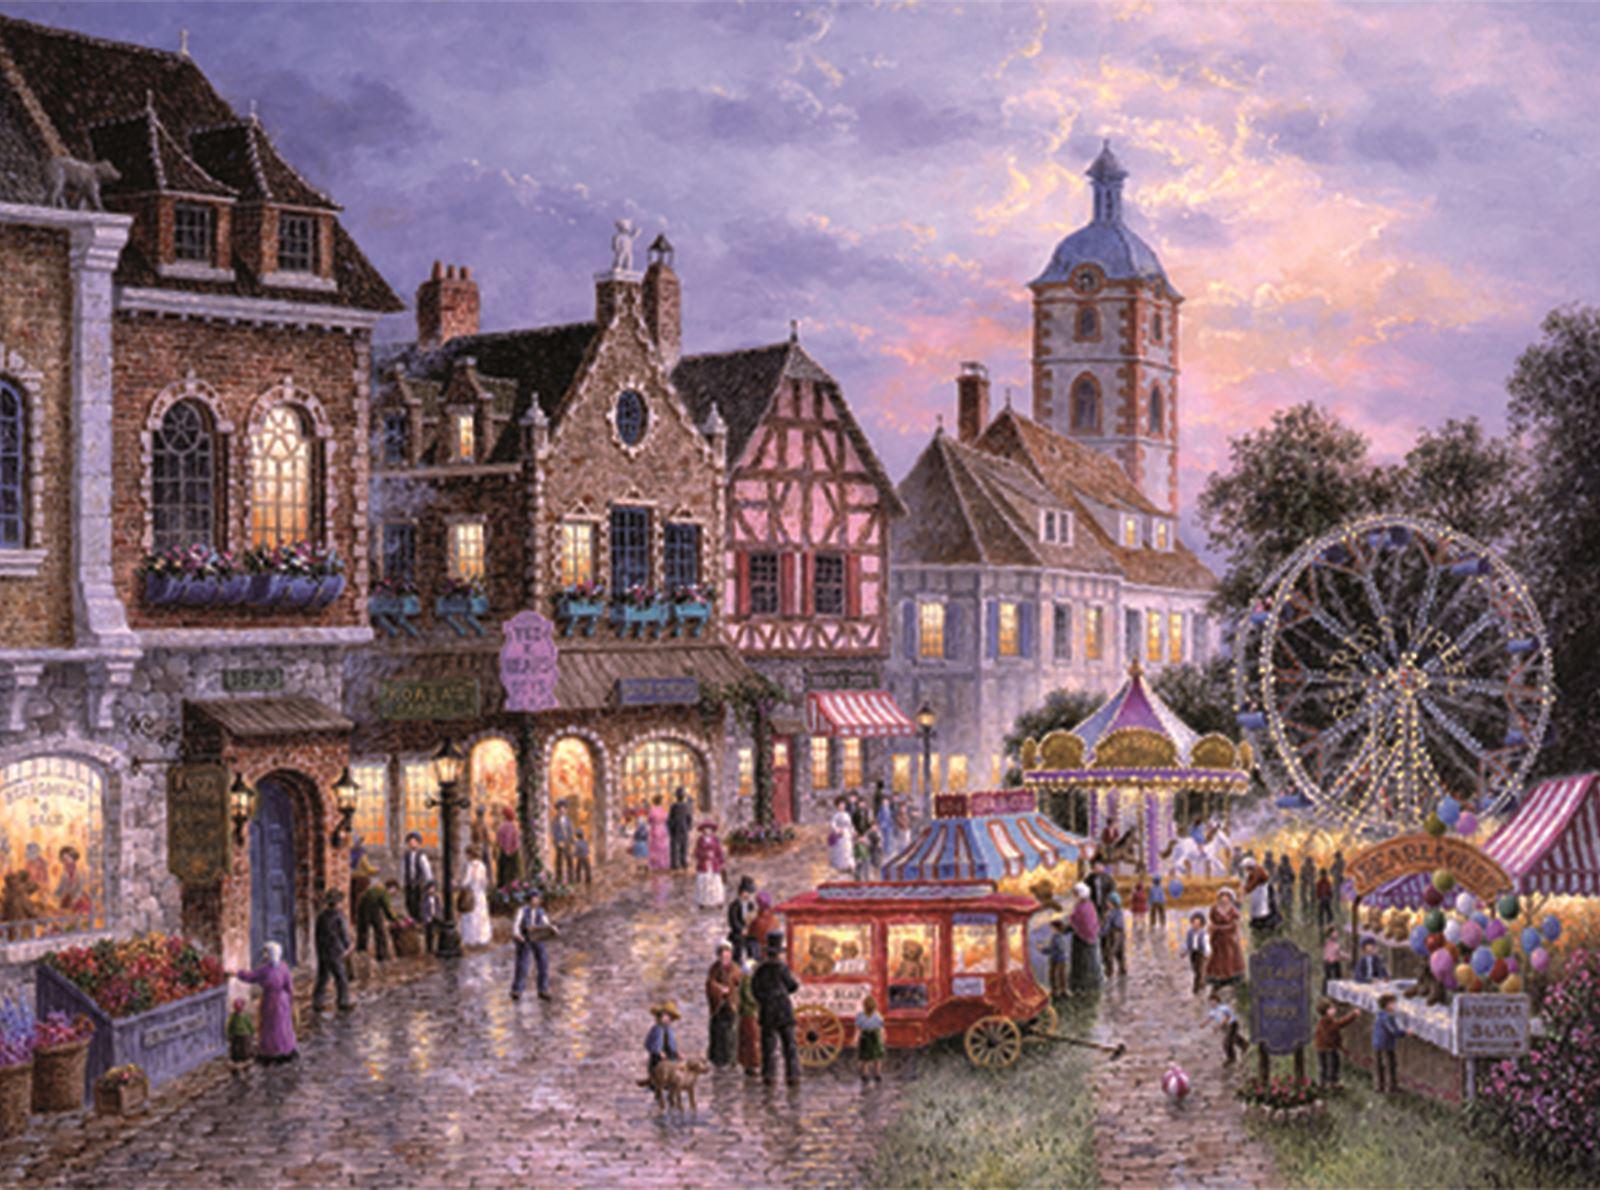 Trefl-300-500-1000-1500-2000-3000-4000-6000-Piece-Jigsaw-Puzzle-Landscapes-City thumbnail 129